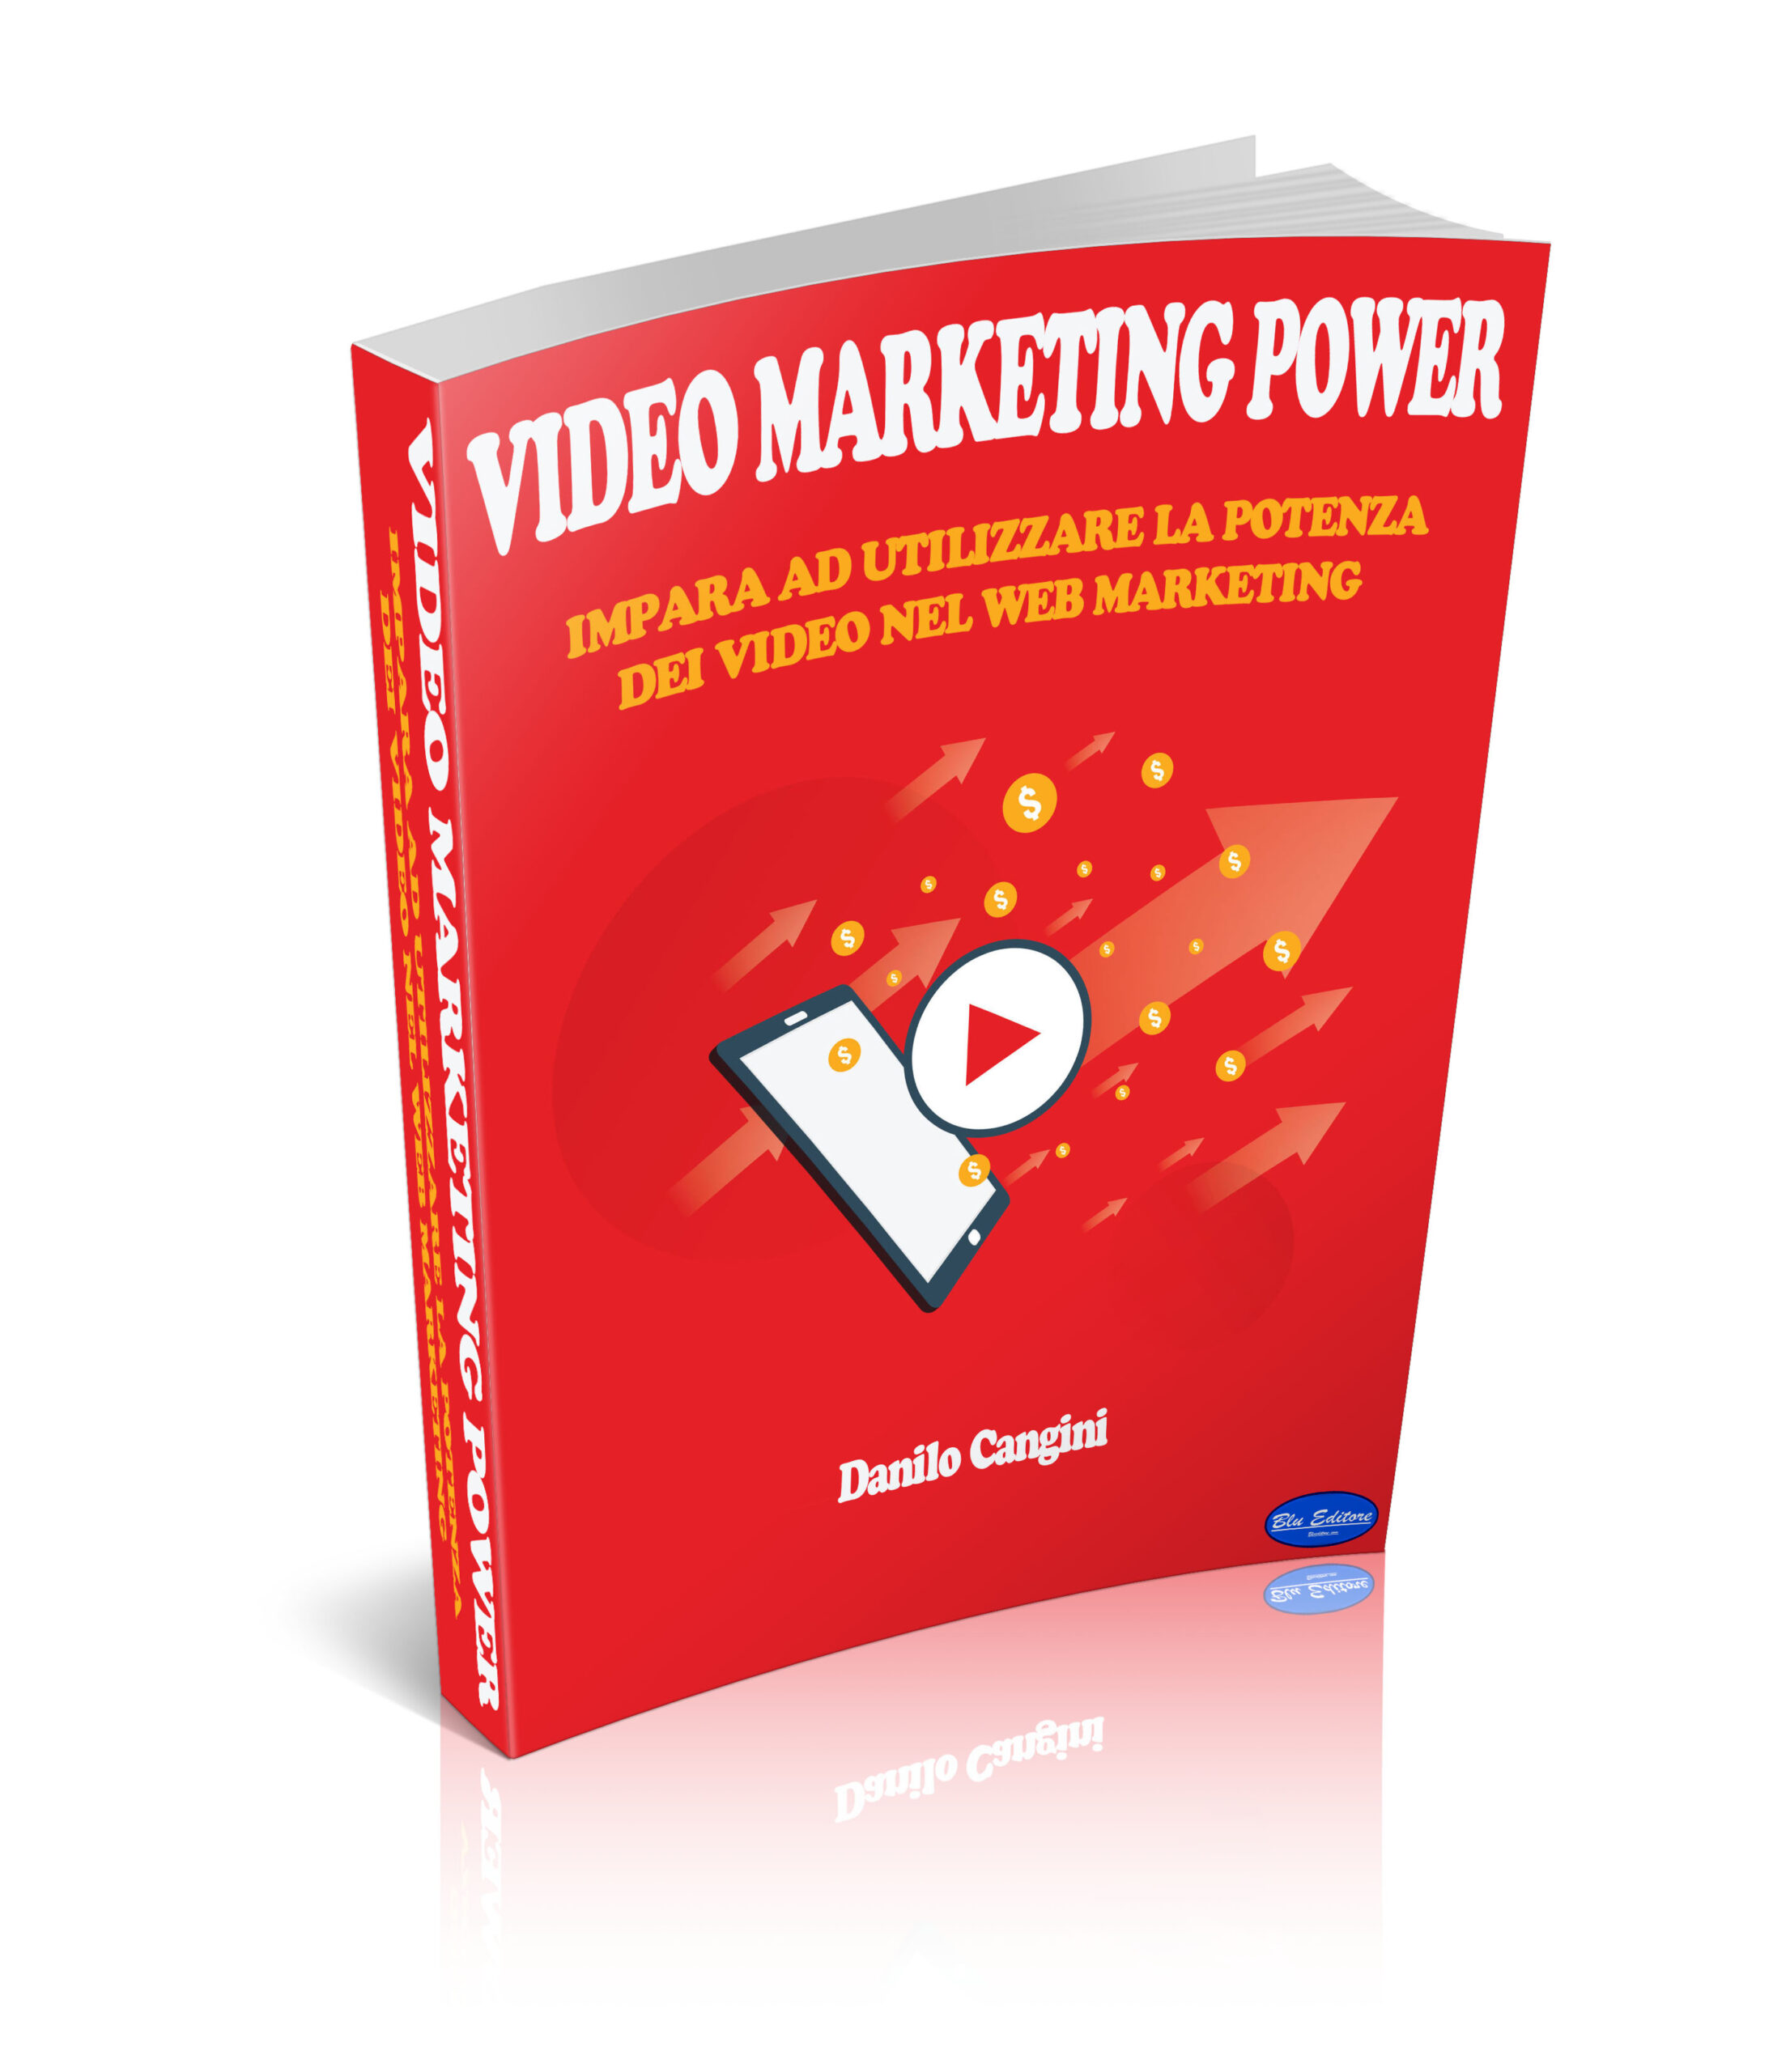 Video Marketing Power